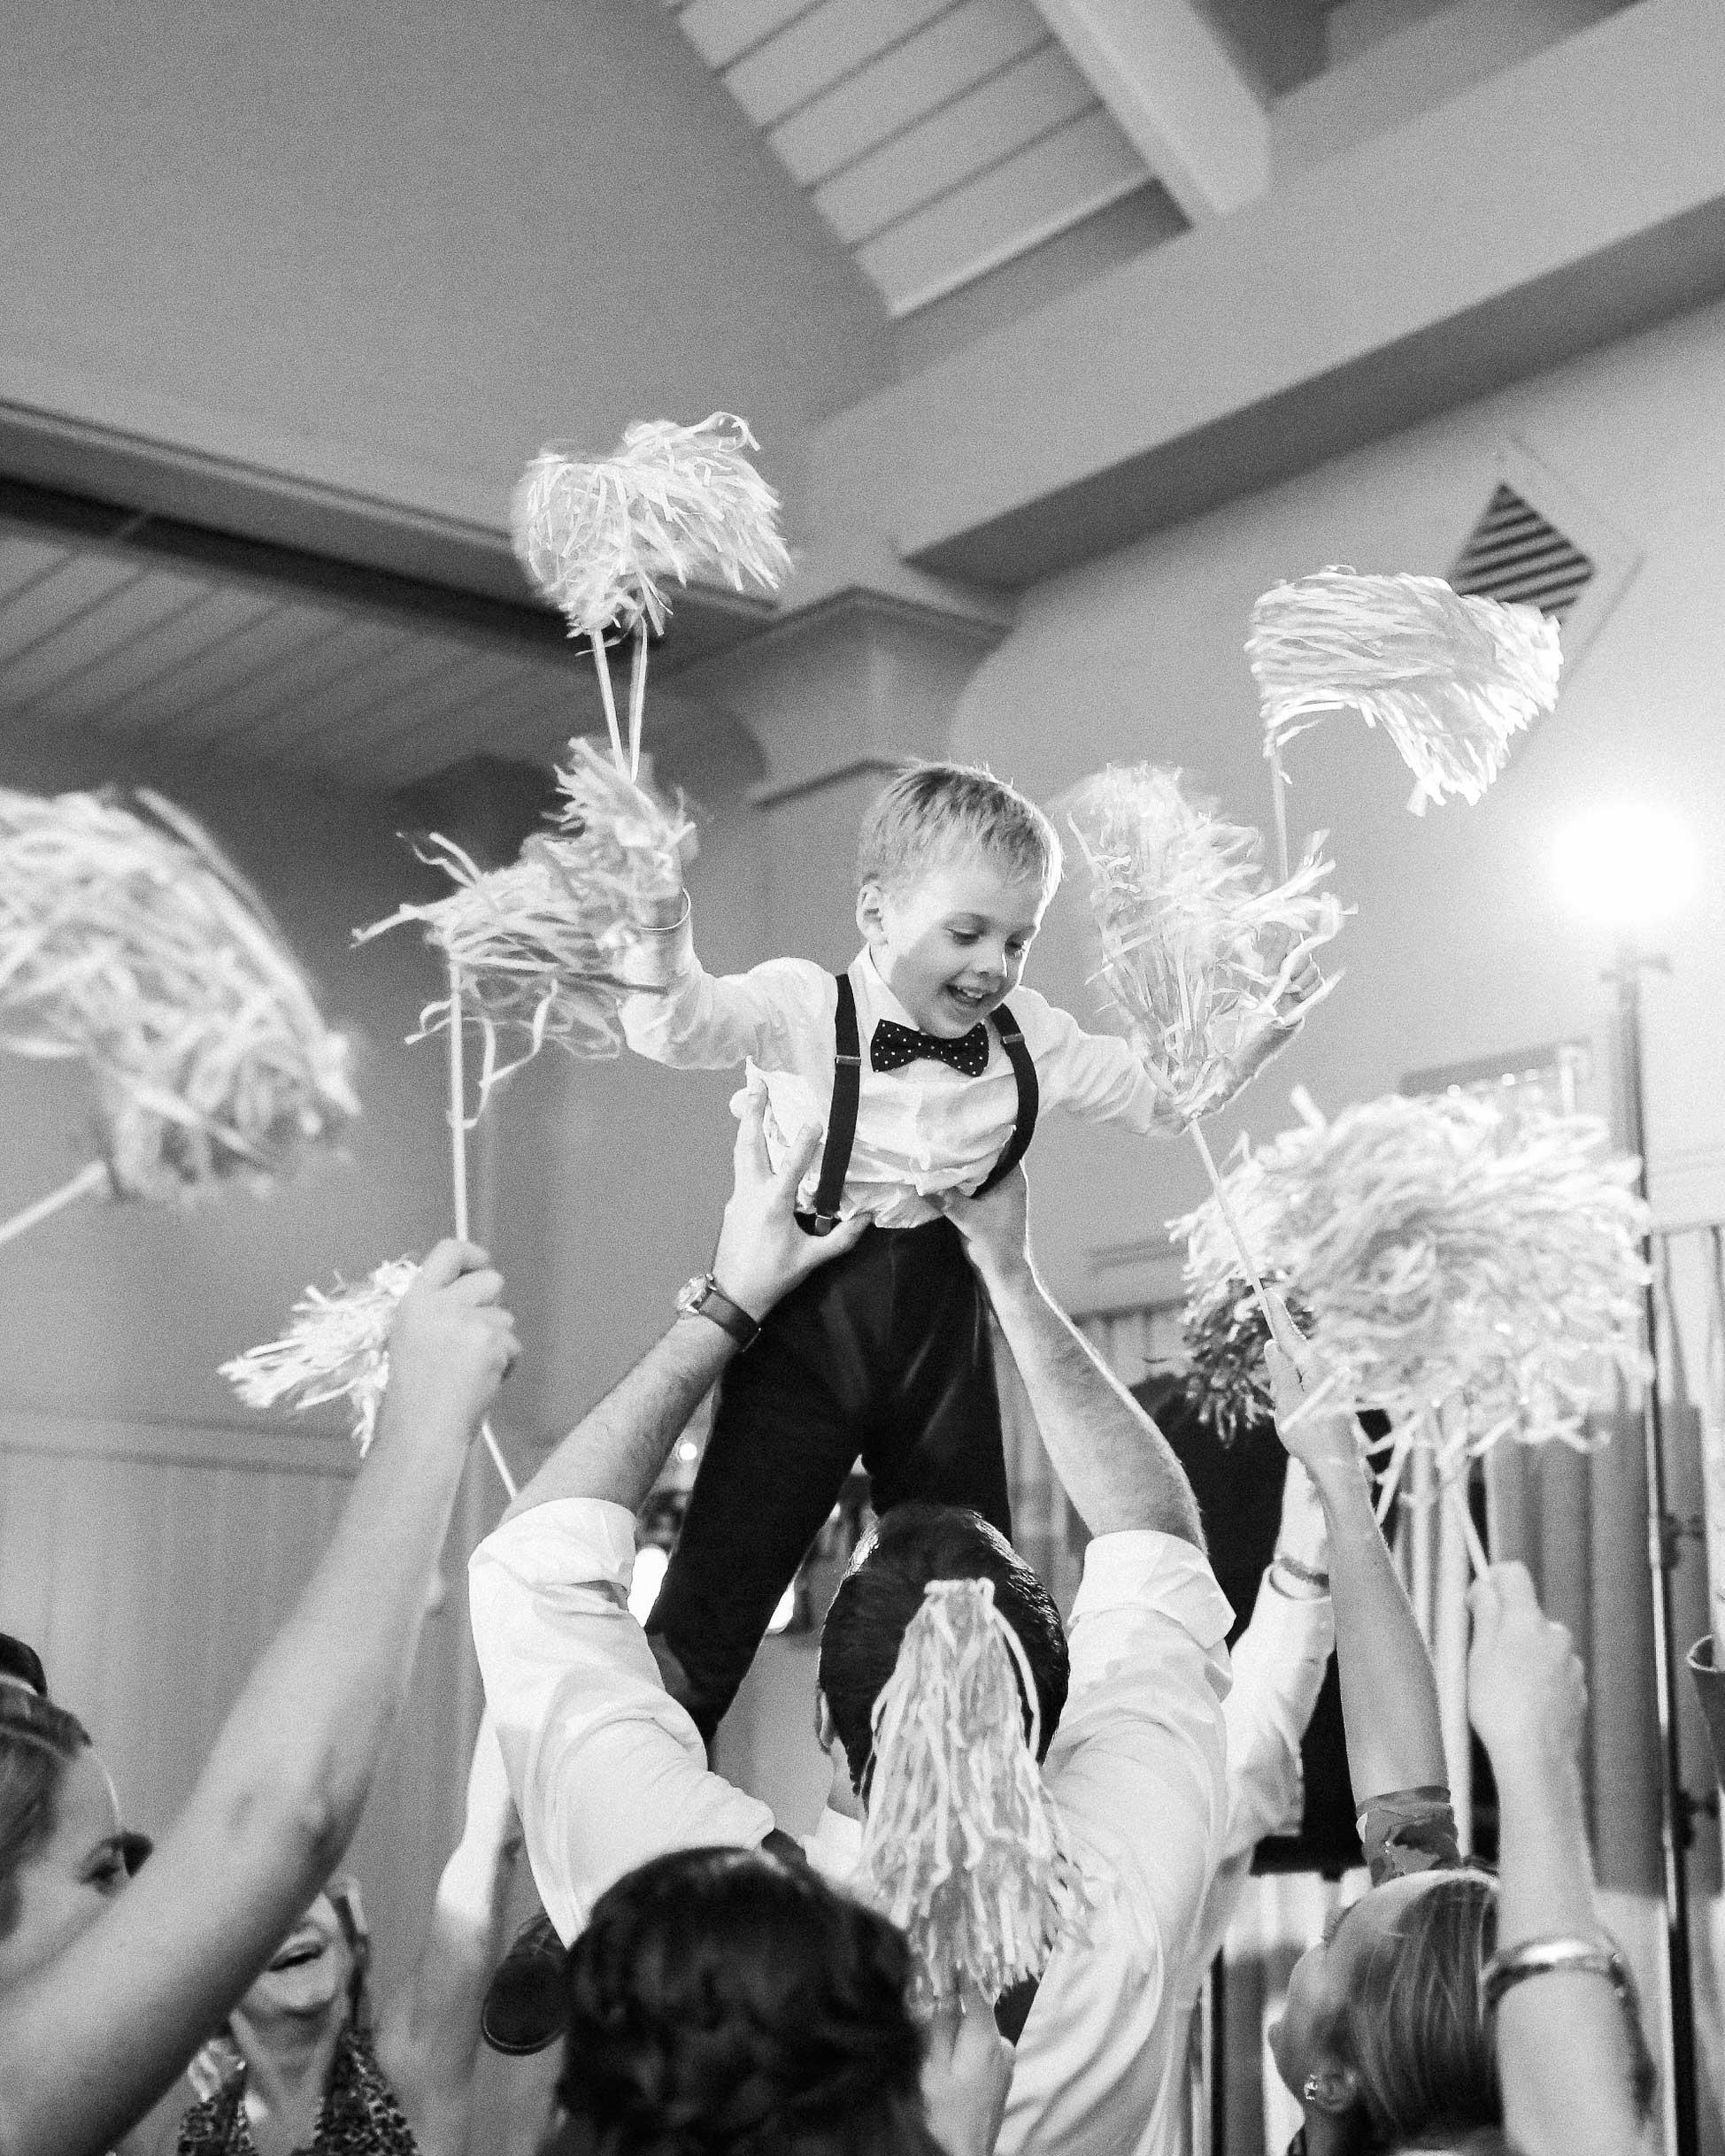 taylor-john-wedding-crowd-surfing-289-s113035-0616.jpg